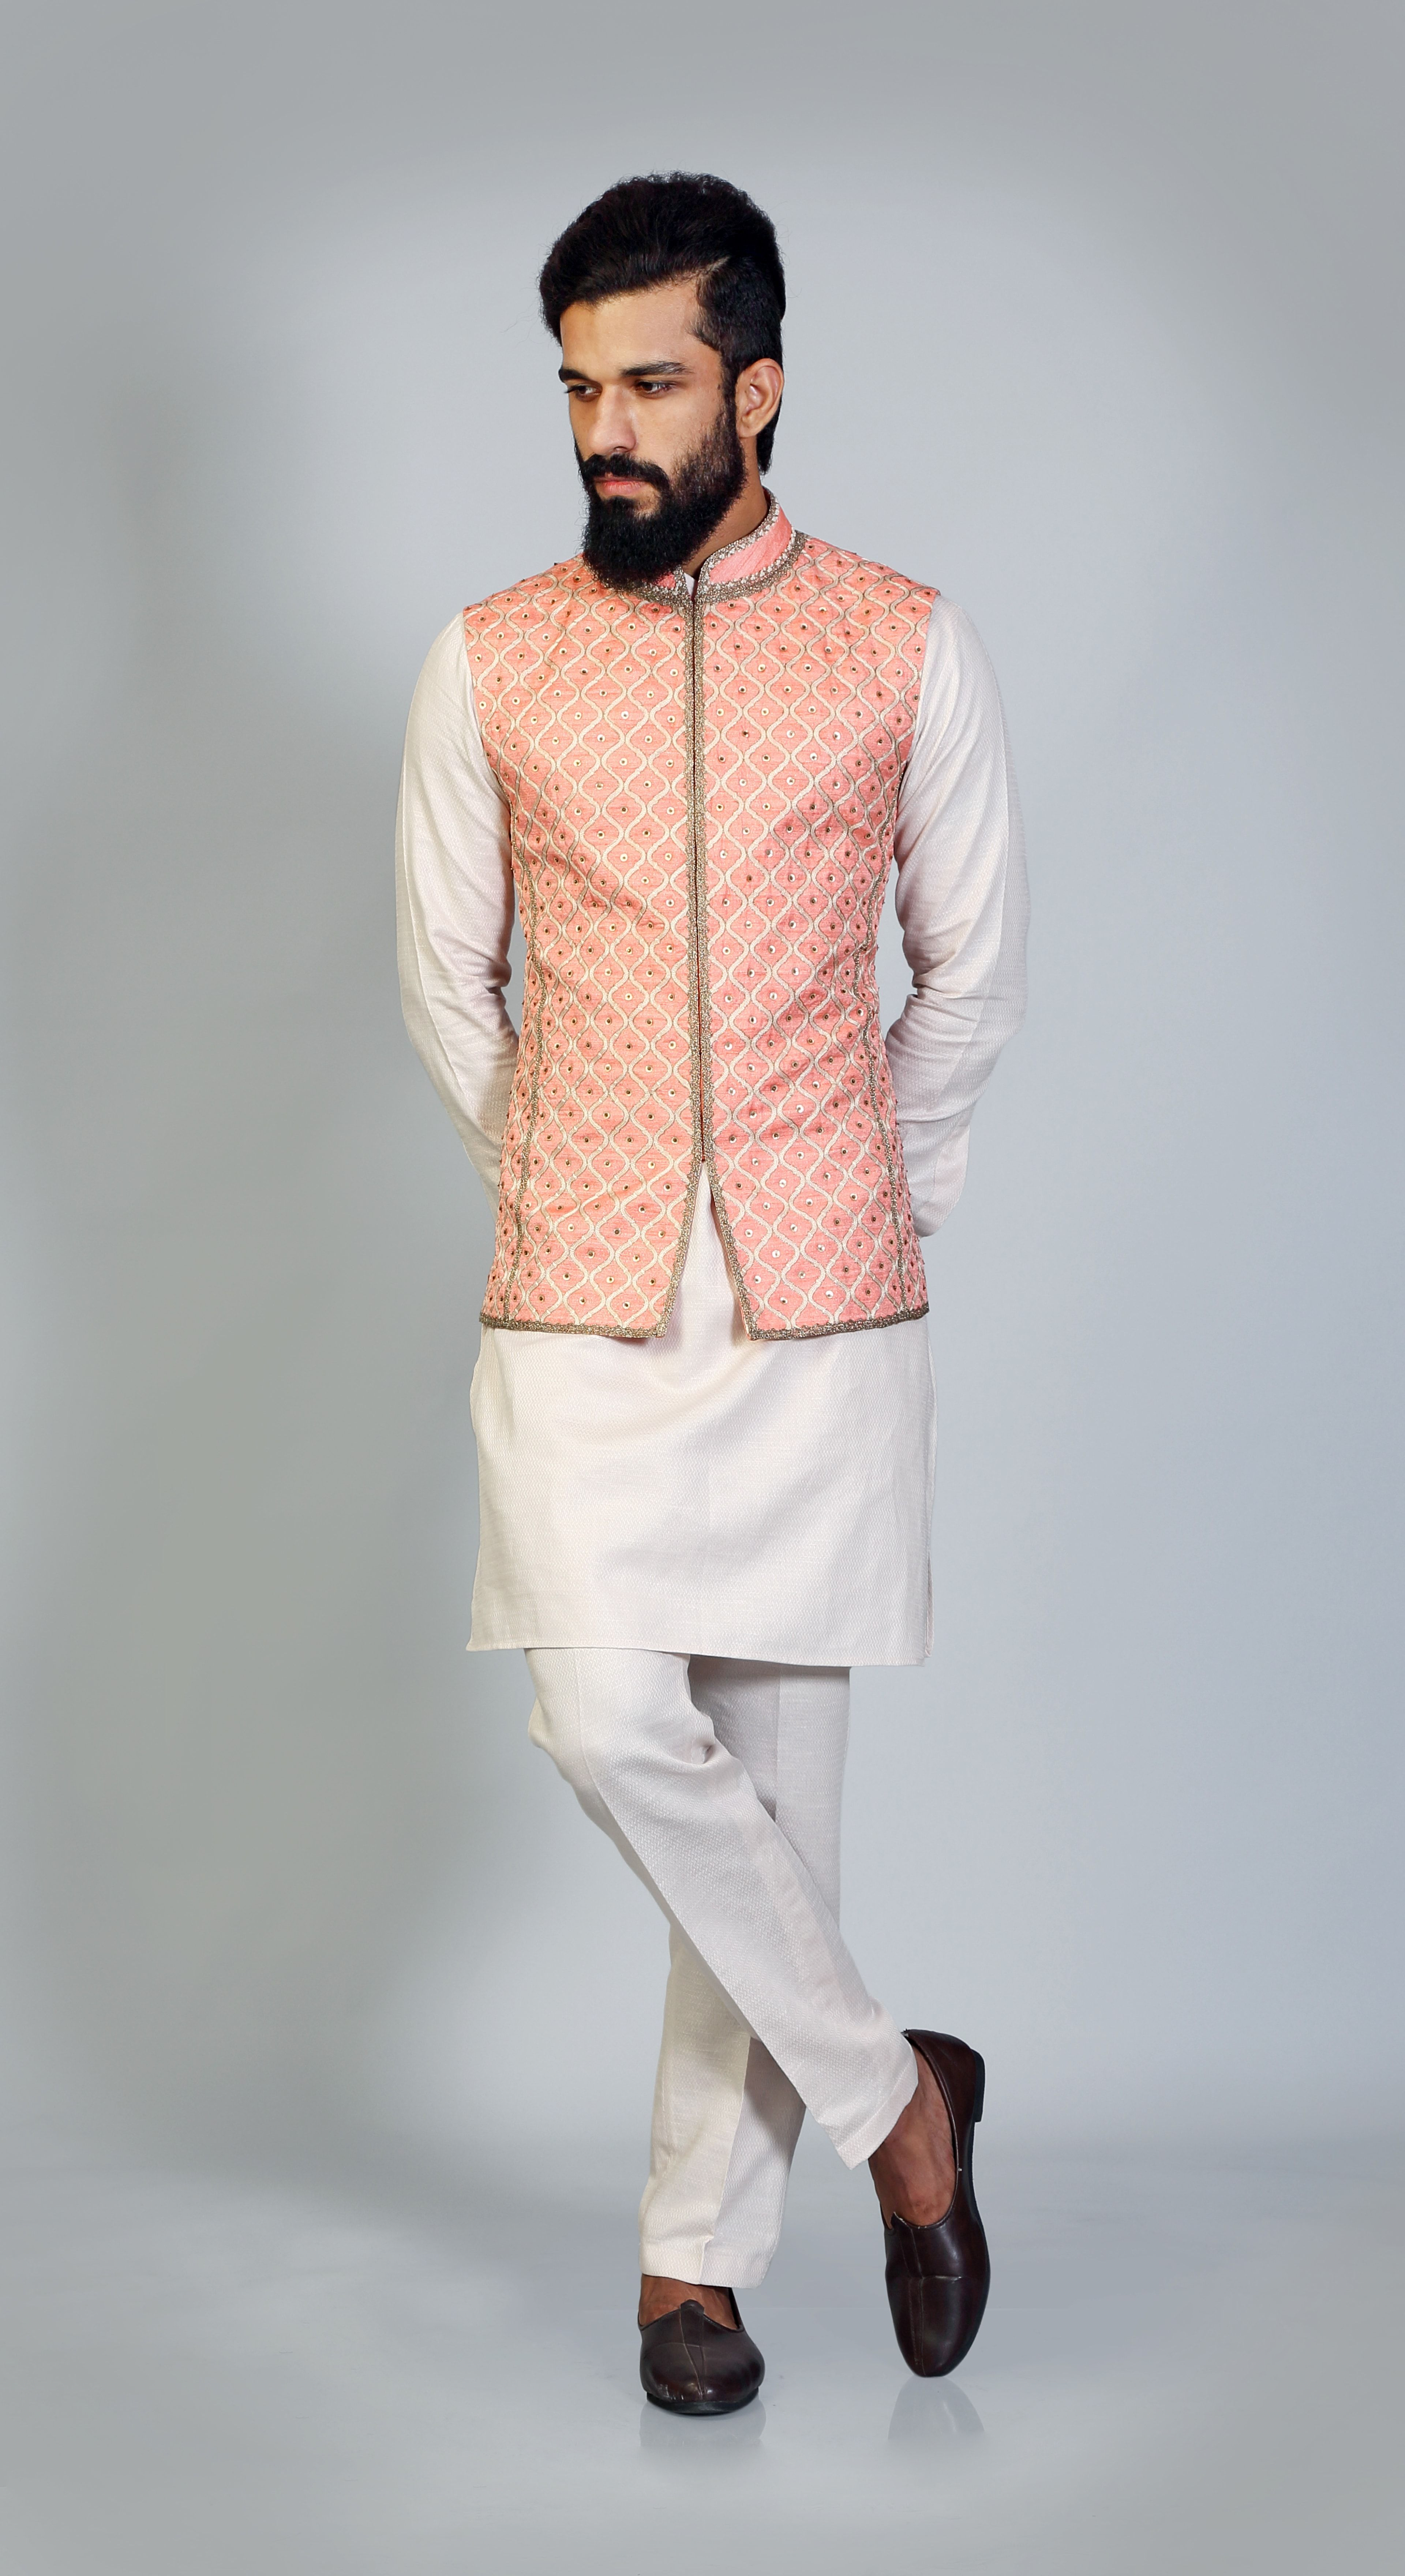 Orange Jharokha Resham Embroidery Sadri Ivory Khadi Kurta Aligarhi Payjama Simple Elegant Ma Indian Men Fashion Indian Groom Wear Wedding Dress Men [ 7040 x 3840 Pixel ]